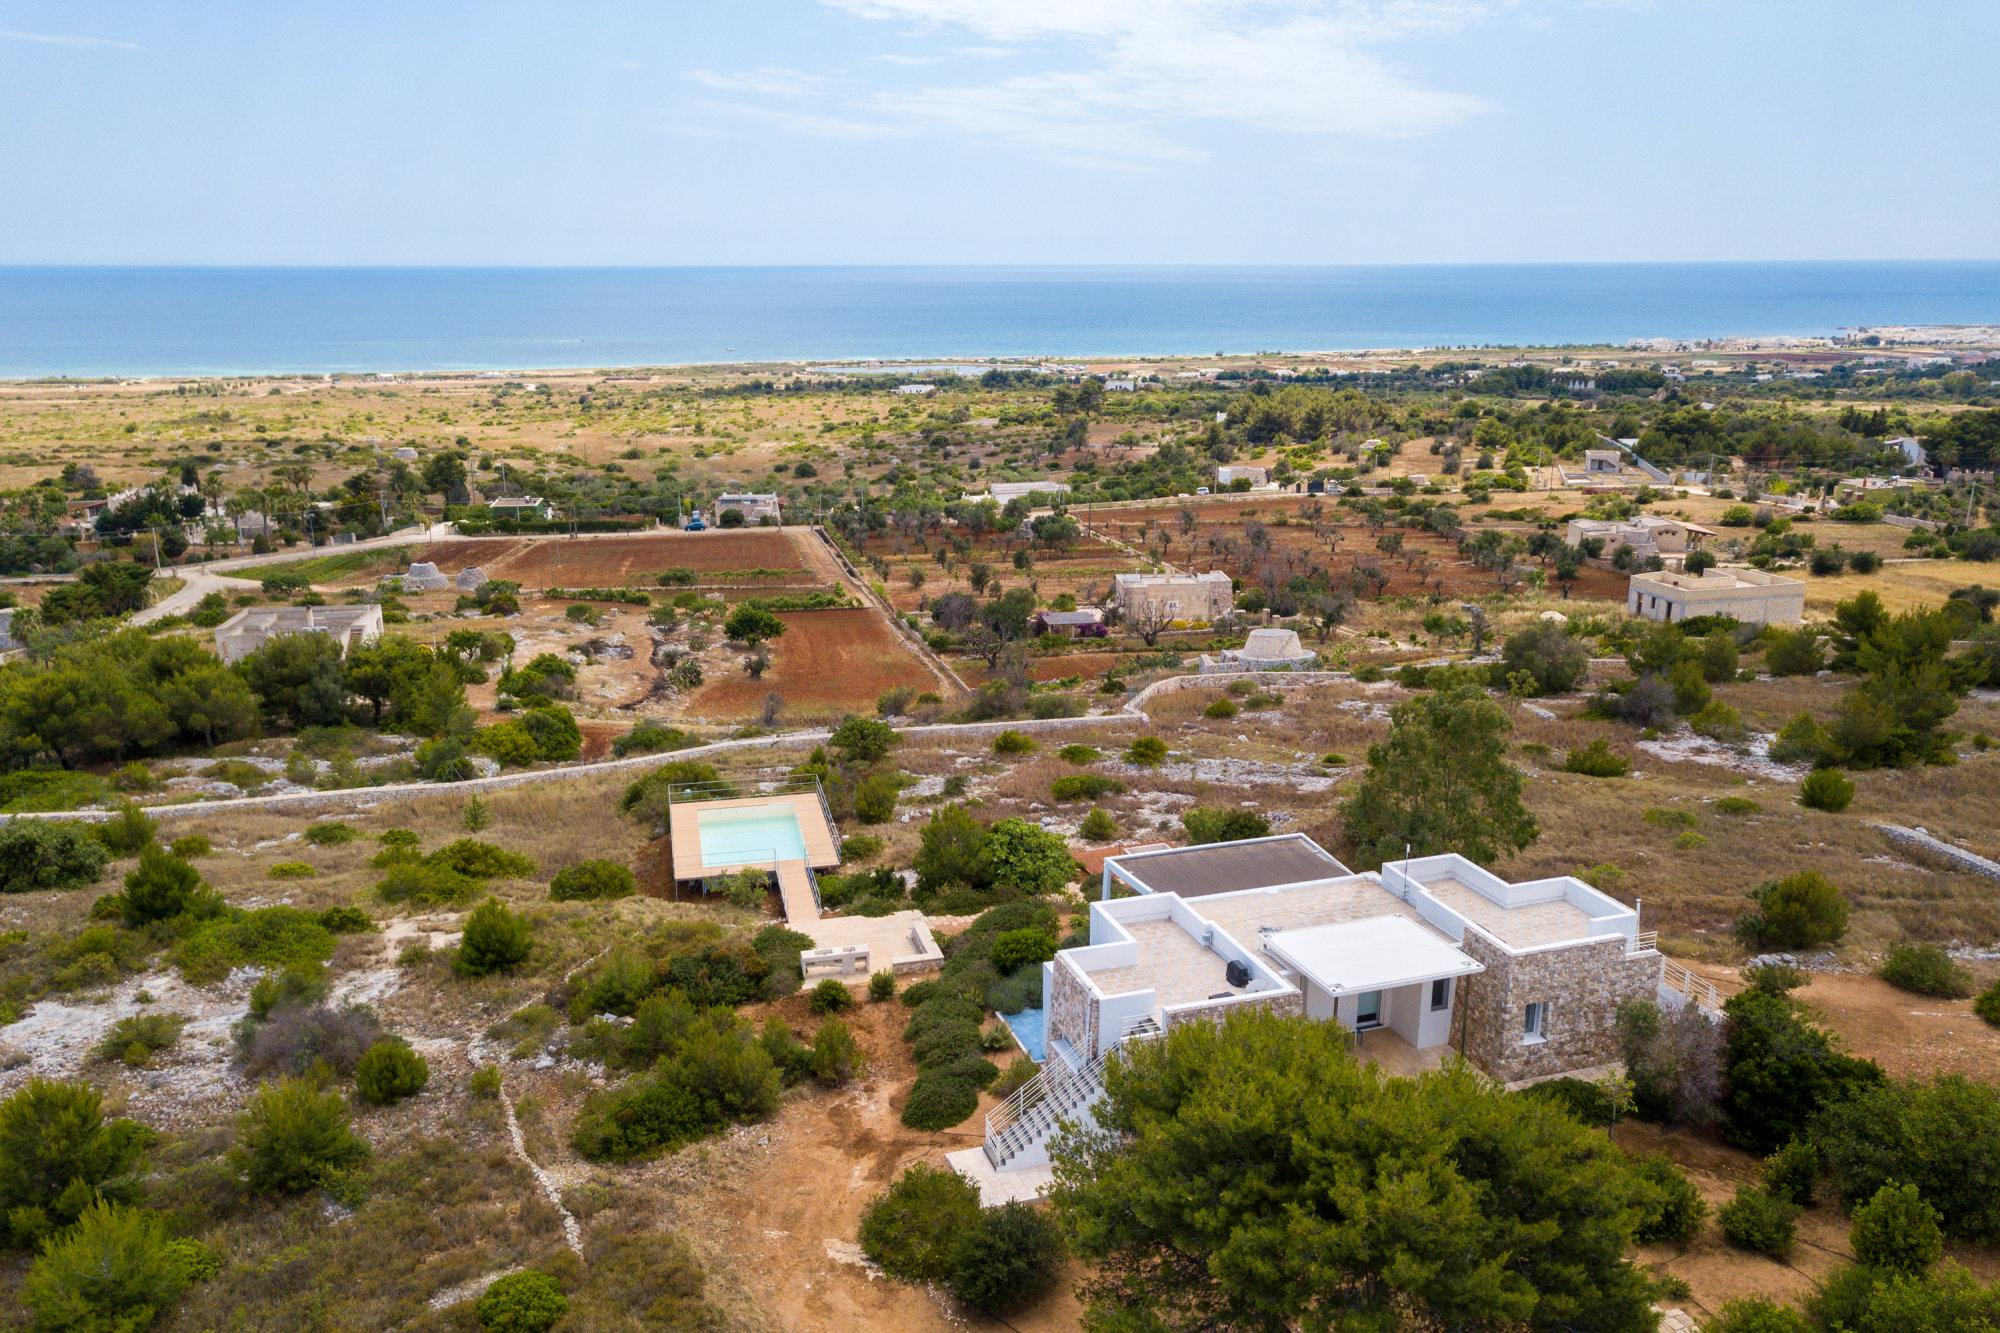 Villa con Piscina fronte mare e panorama incantevole - Salve